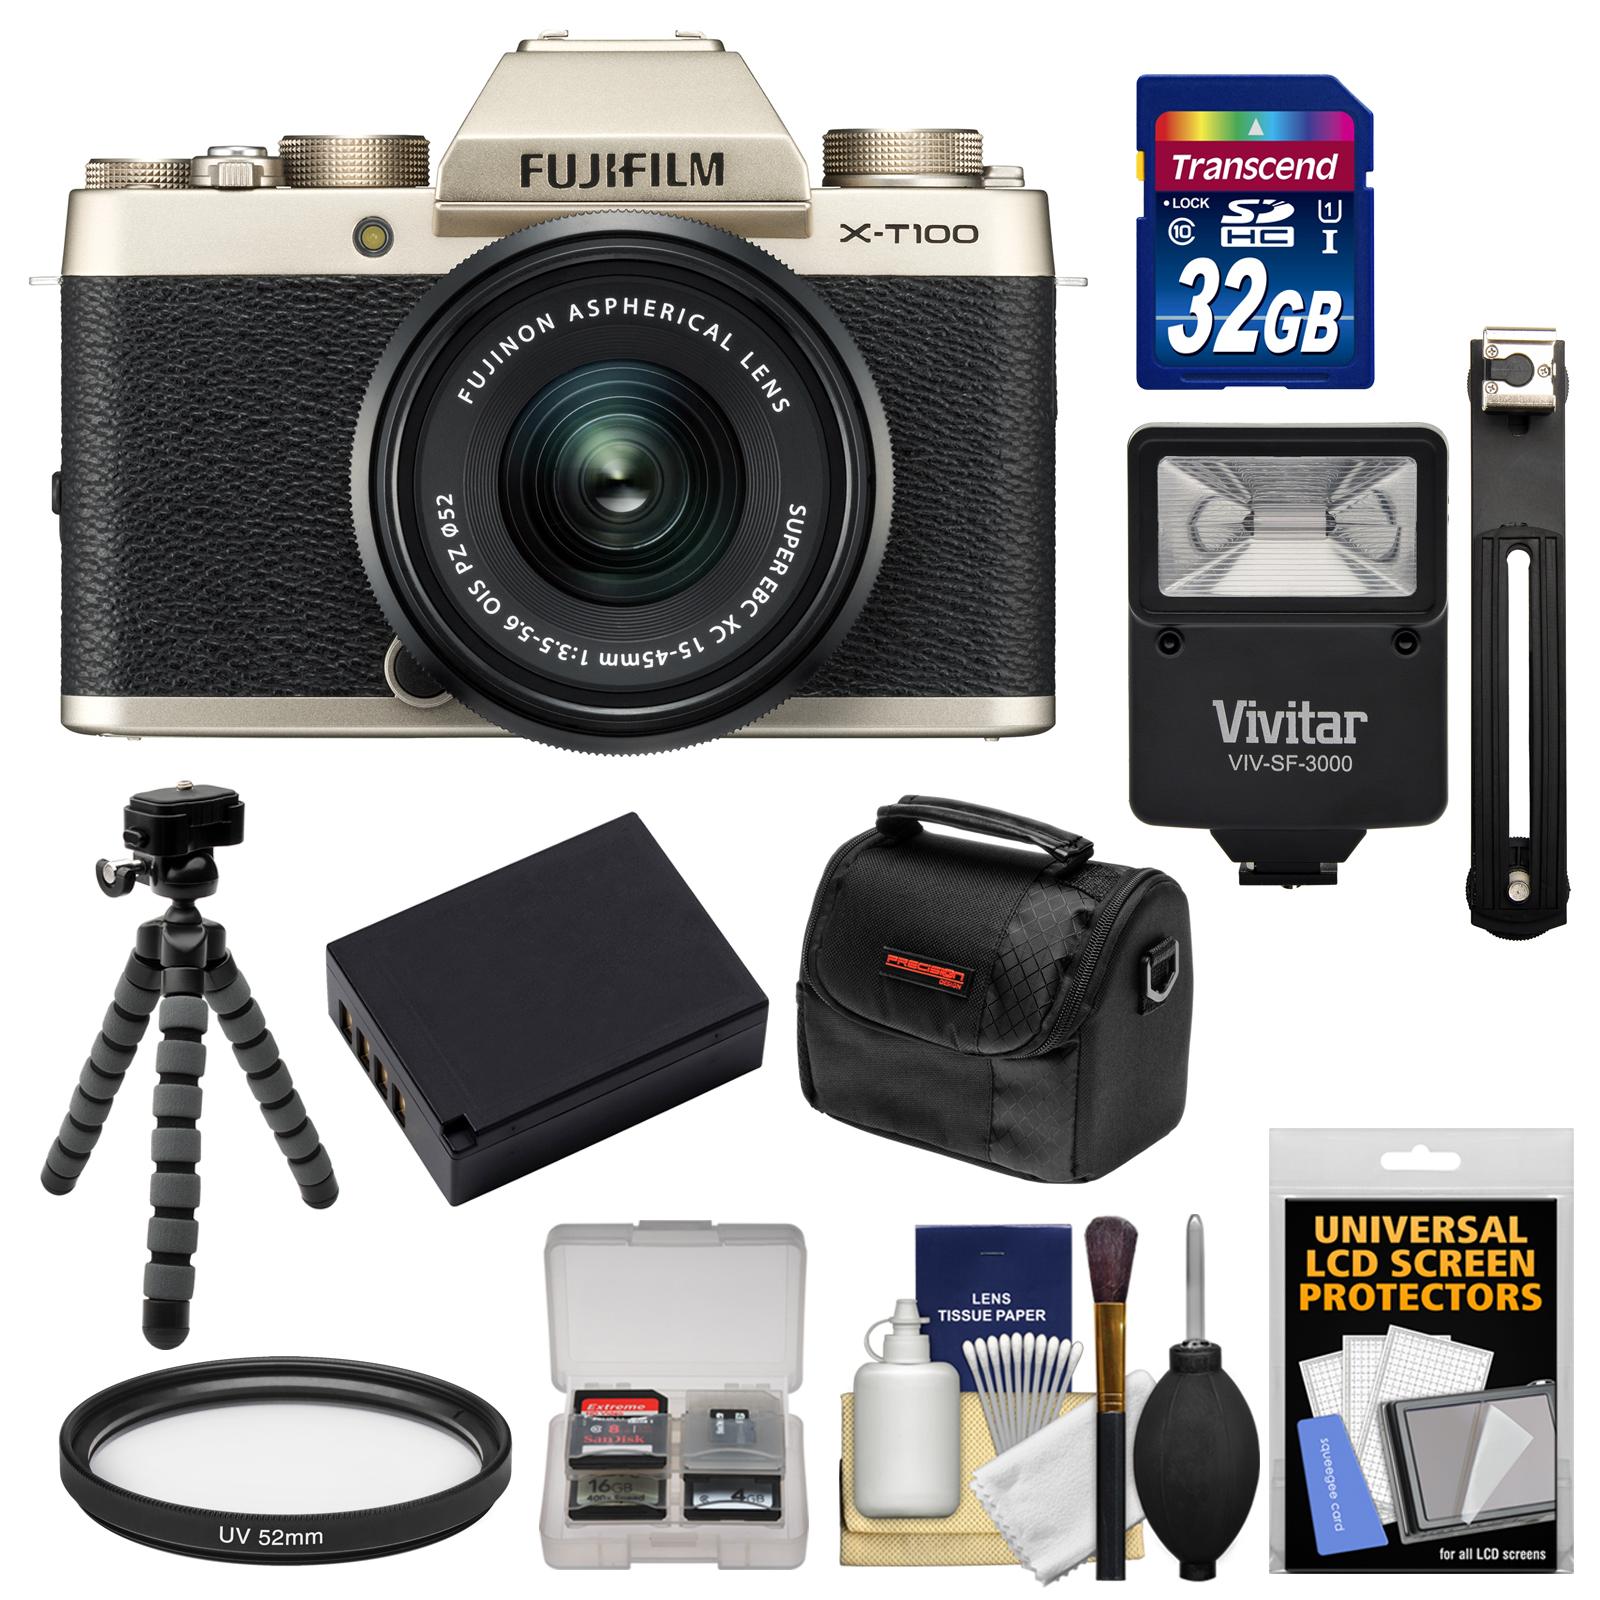 Fujifilm X-T100 Digital Camera & 15-45mm XC OIS PZ Lens (Champagne Gold) with 32GB Card + Battery + Tripod + Flash + Case + Kit